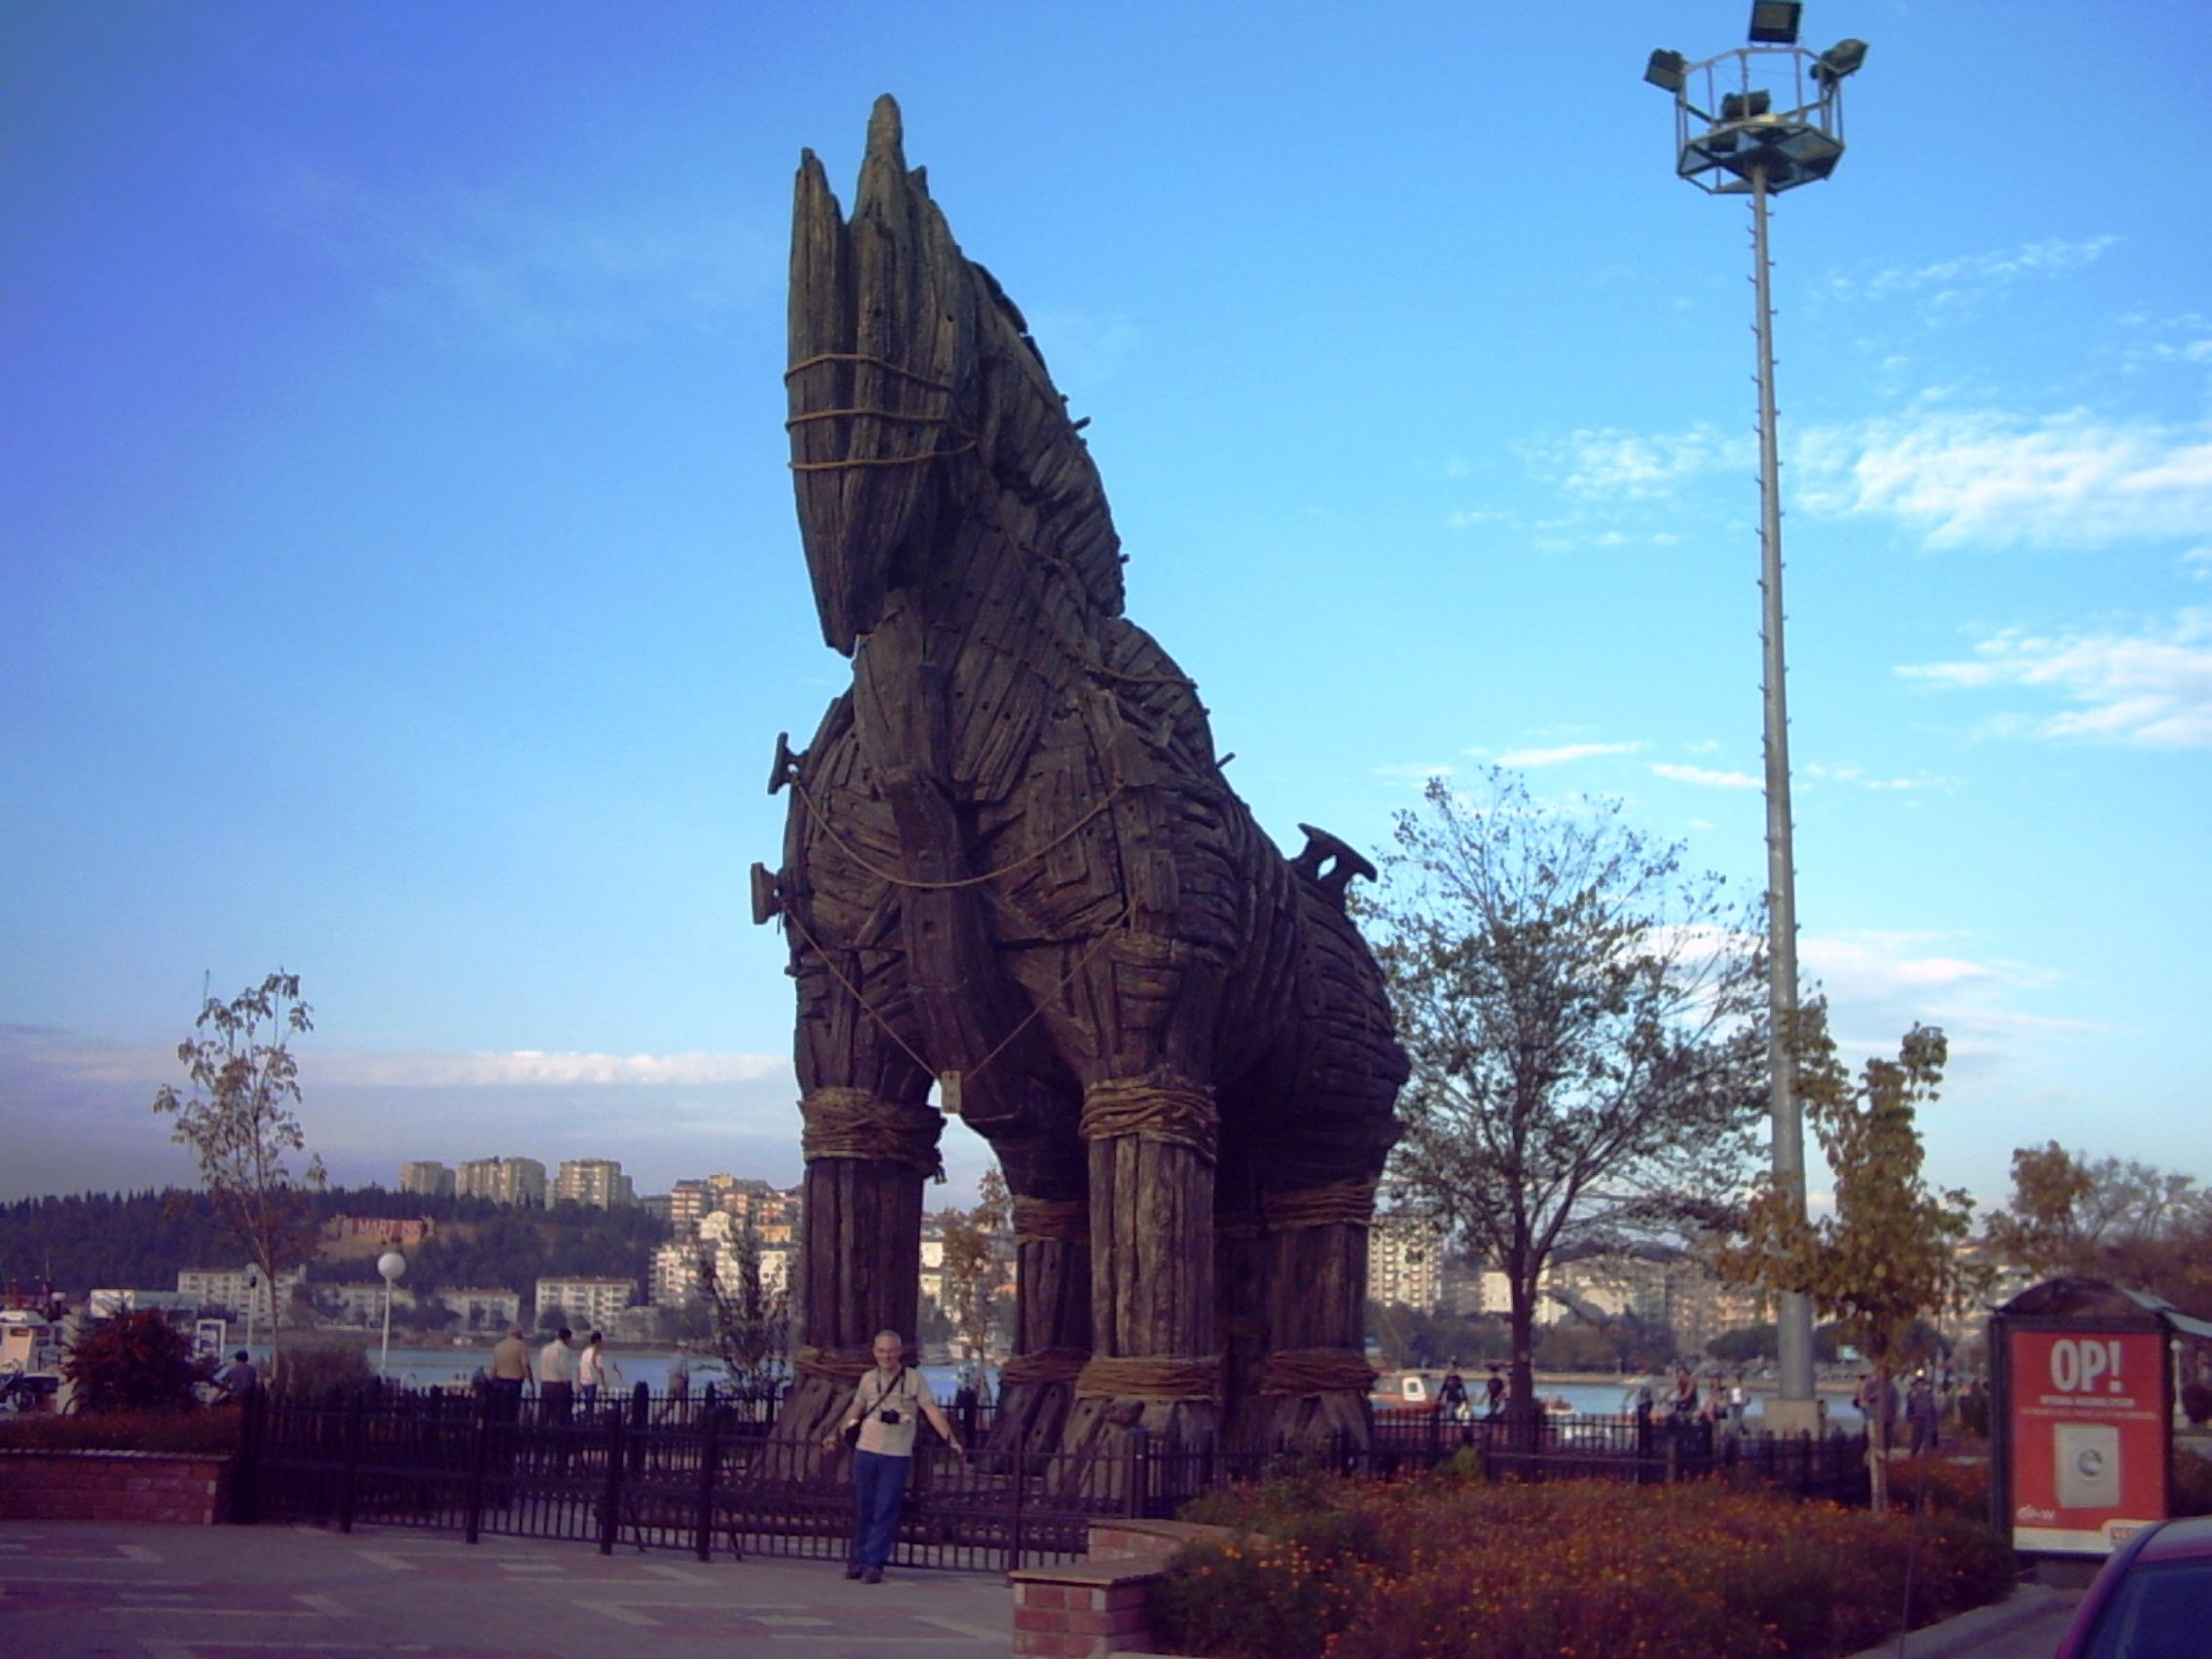 File:Çanakkale trojan horse.jpg - Wikipedia, the free ...